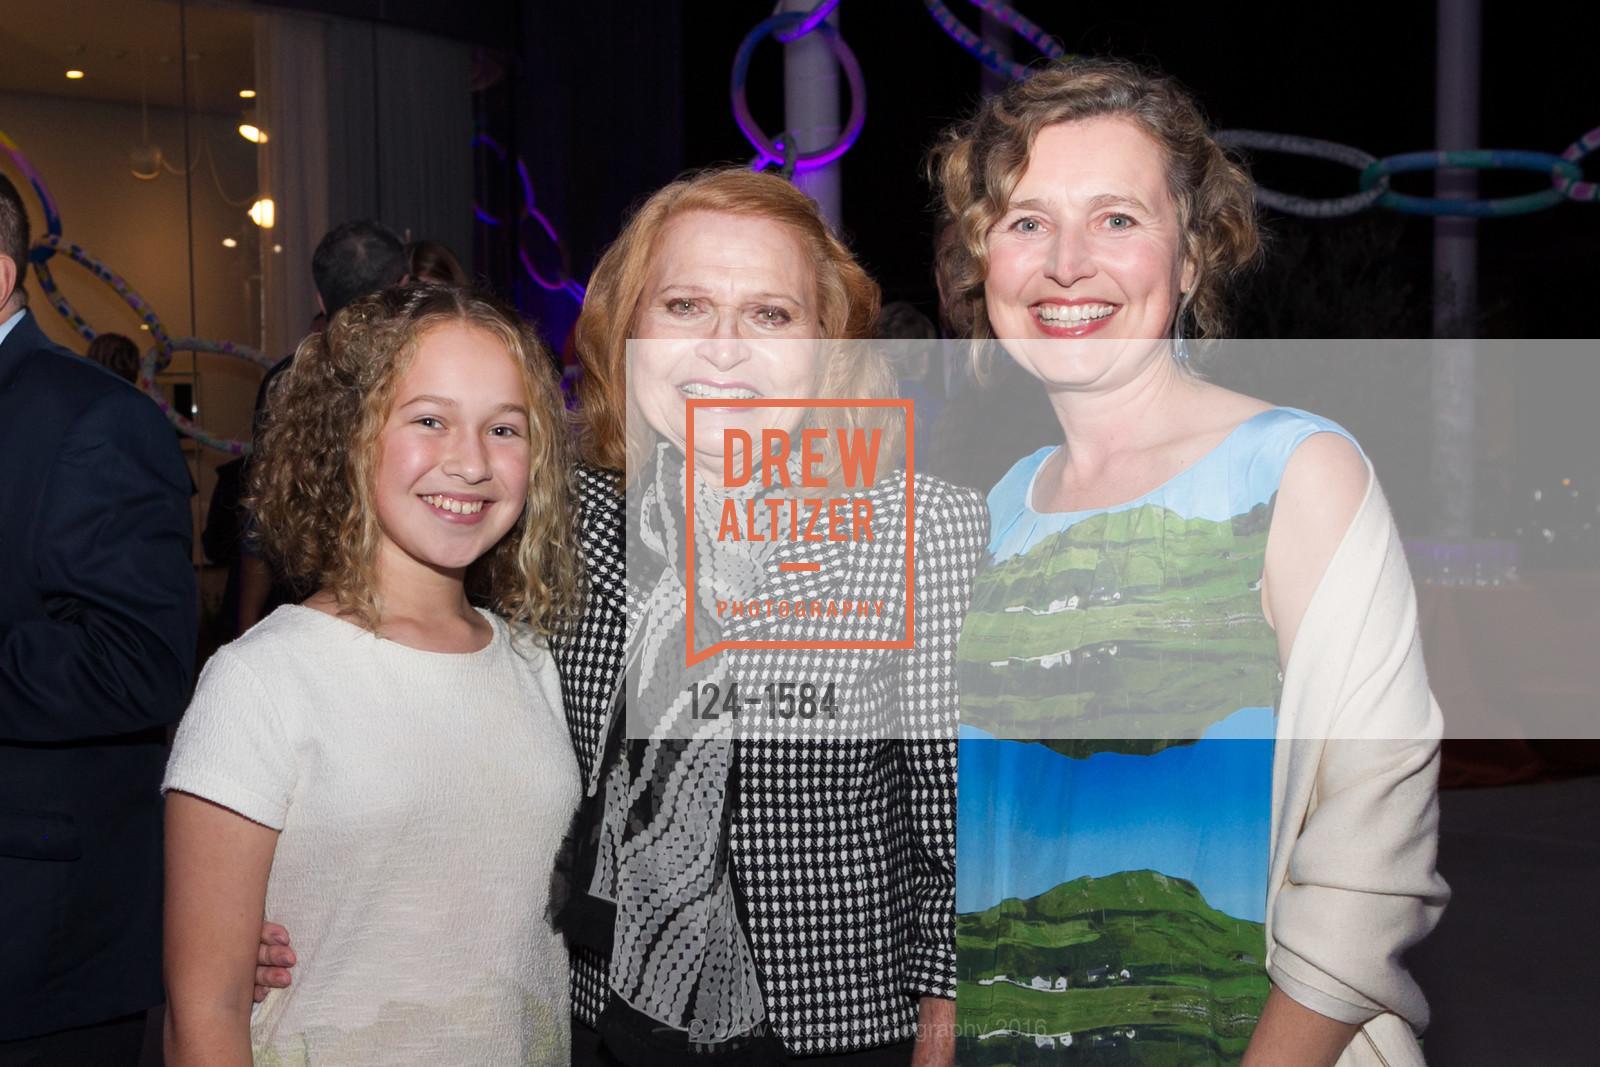 Jessica Howe, Director's Debut, Manetti Shrem Museum of Art. Old Davis Road at Alumni Lane, November 12th, 2016